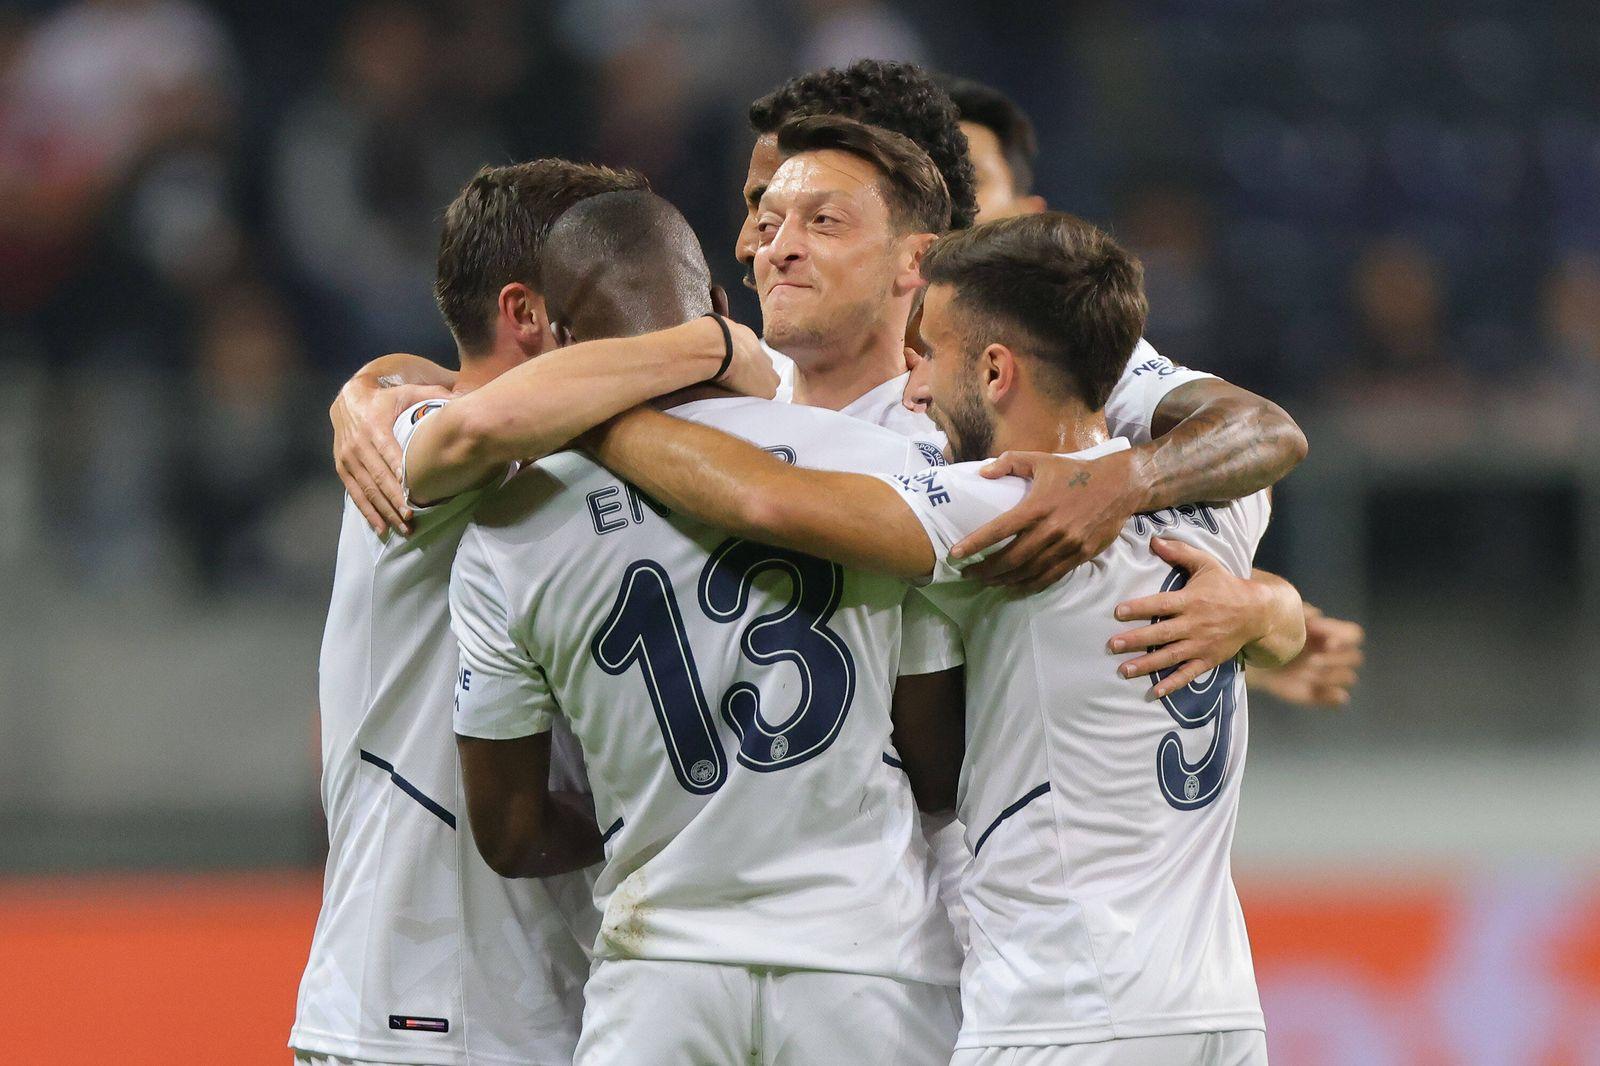 Eintracht Frankfurt - Fenerbahce SK, UEFA Europa League Tor für Fenerbahce zum 0:1 durch Mesut Özil (Fenerbahce SK, 10).